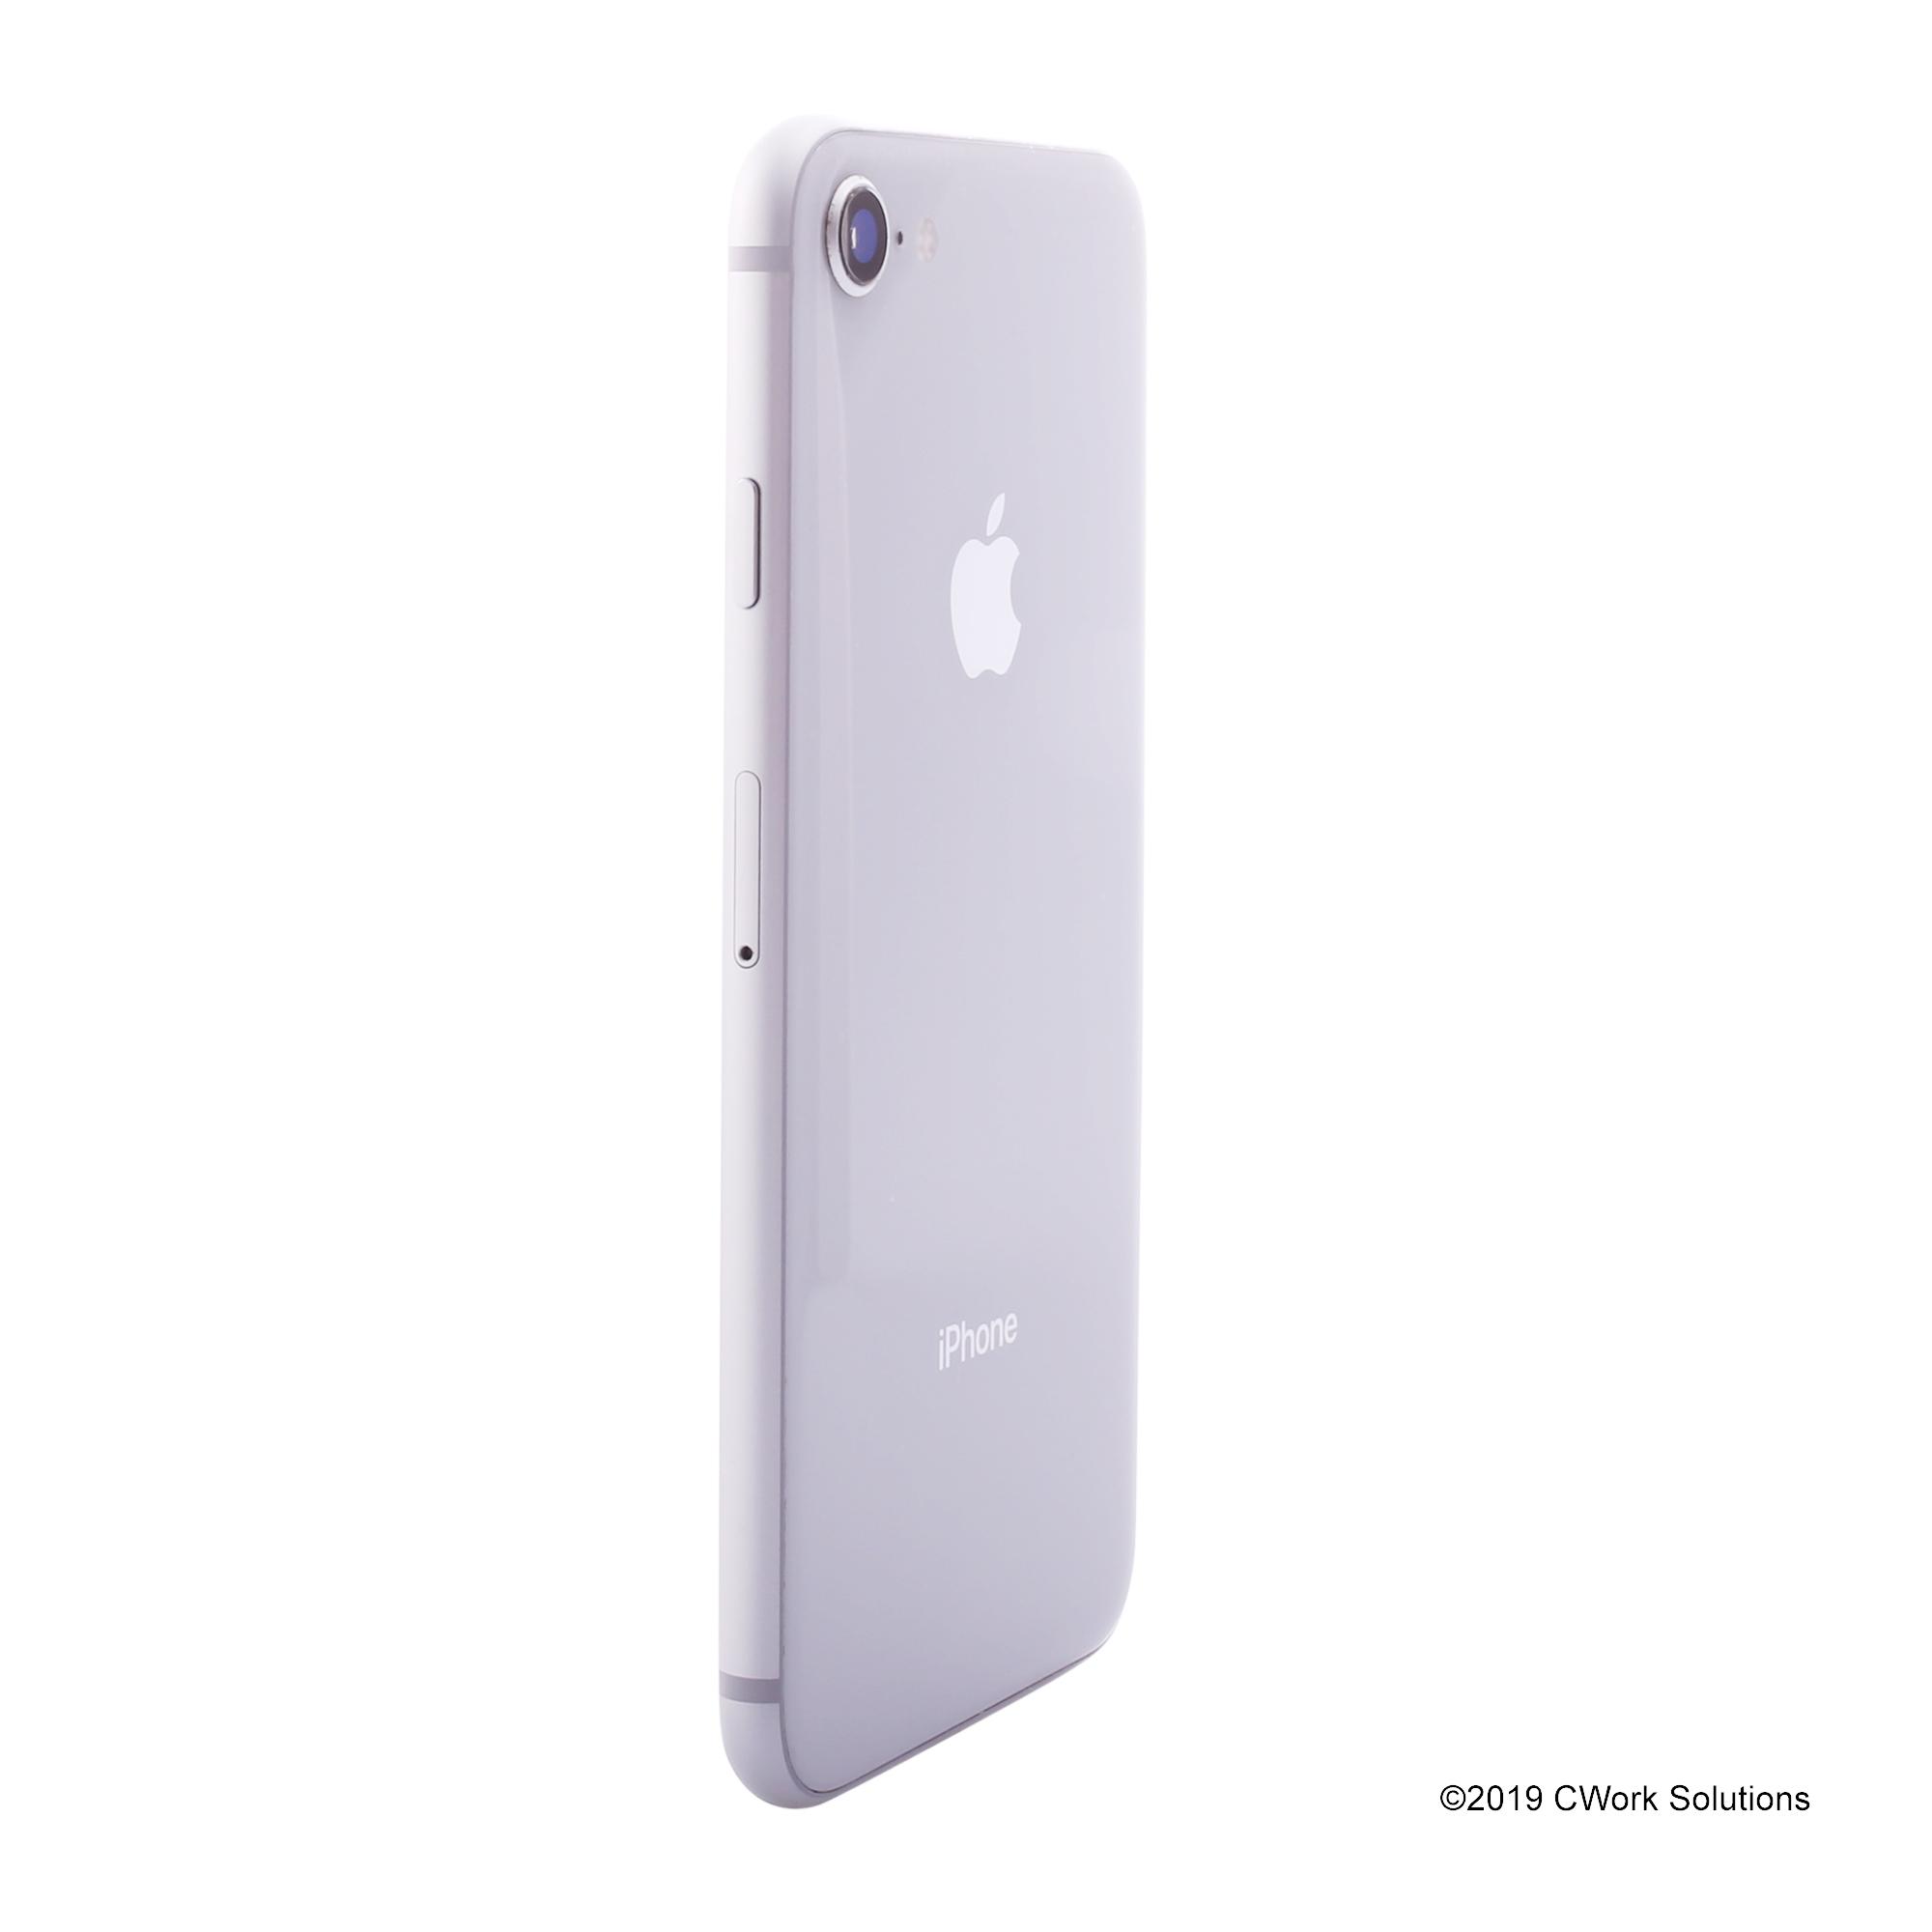 Apple-iPhone-8-a1863-64GB-Verizon-Unlocked-Excellent thumbnail 21